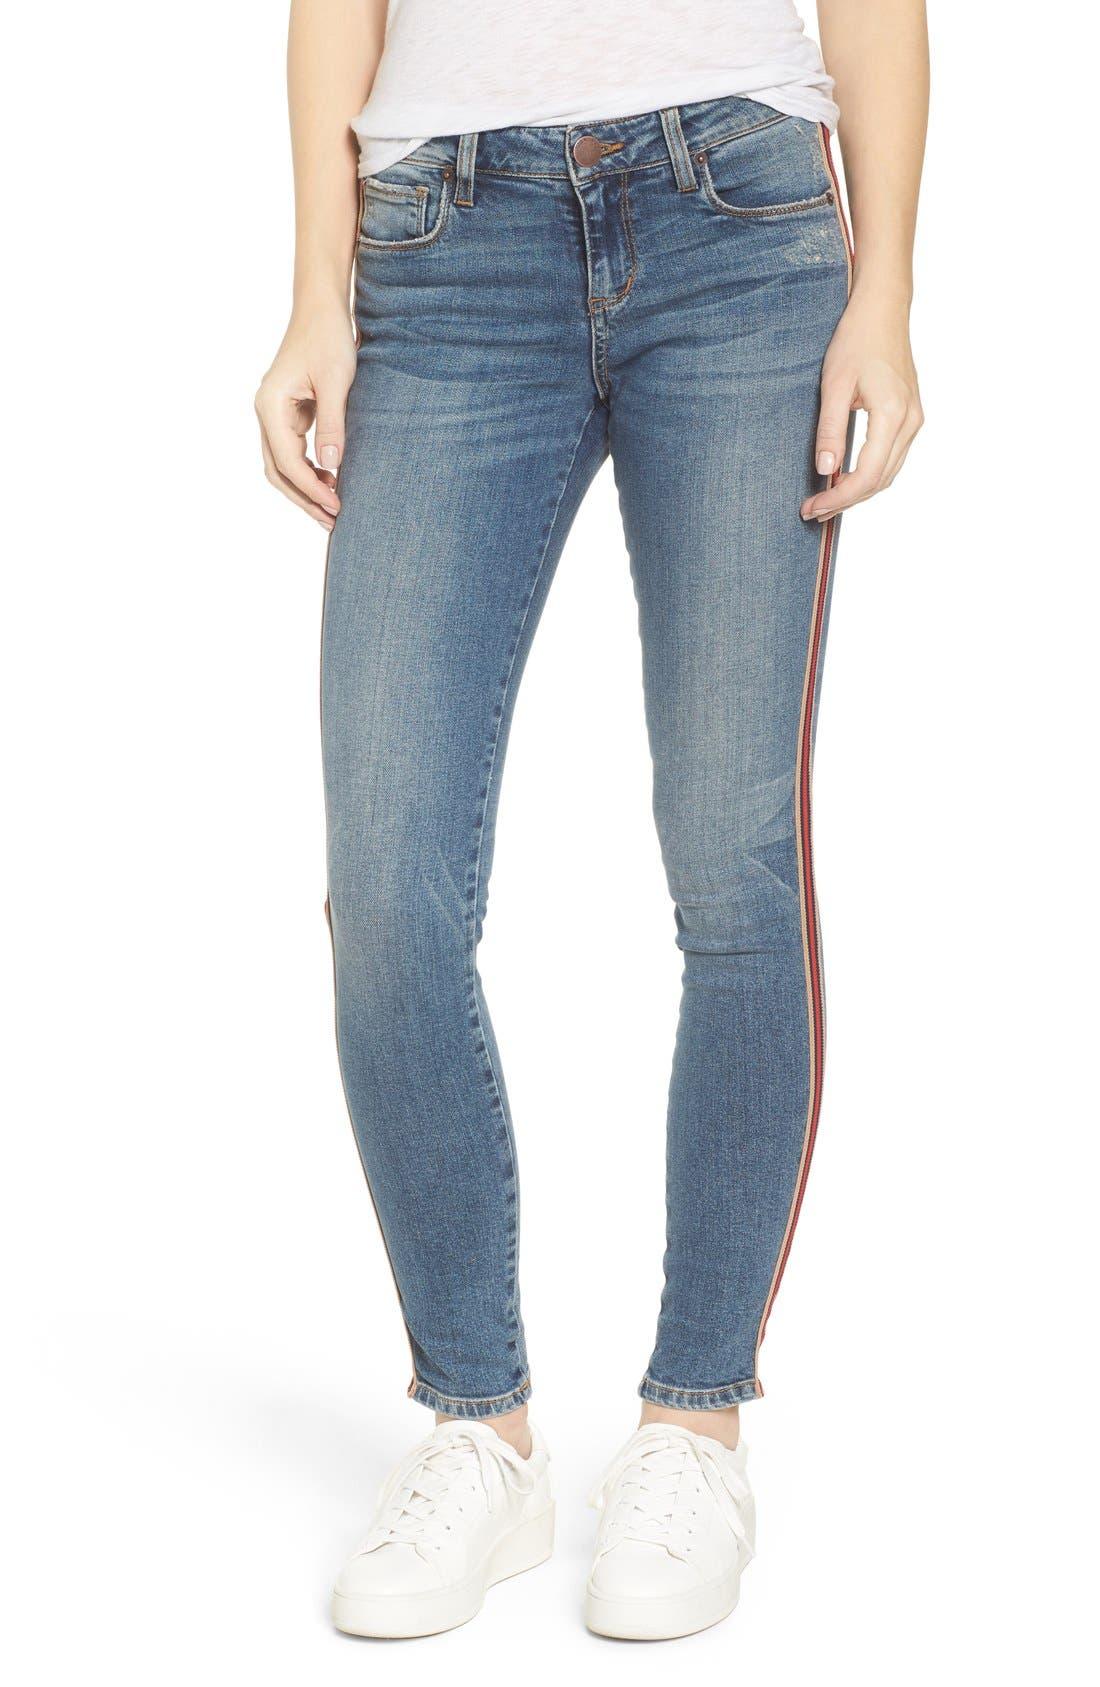 Alternate Image 1 Selected - STS Blue Piper Athletic Stripe Skinny Jeans (West Oakville)